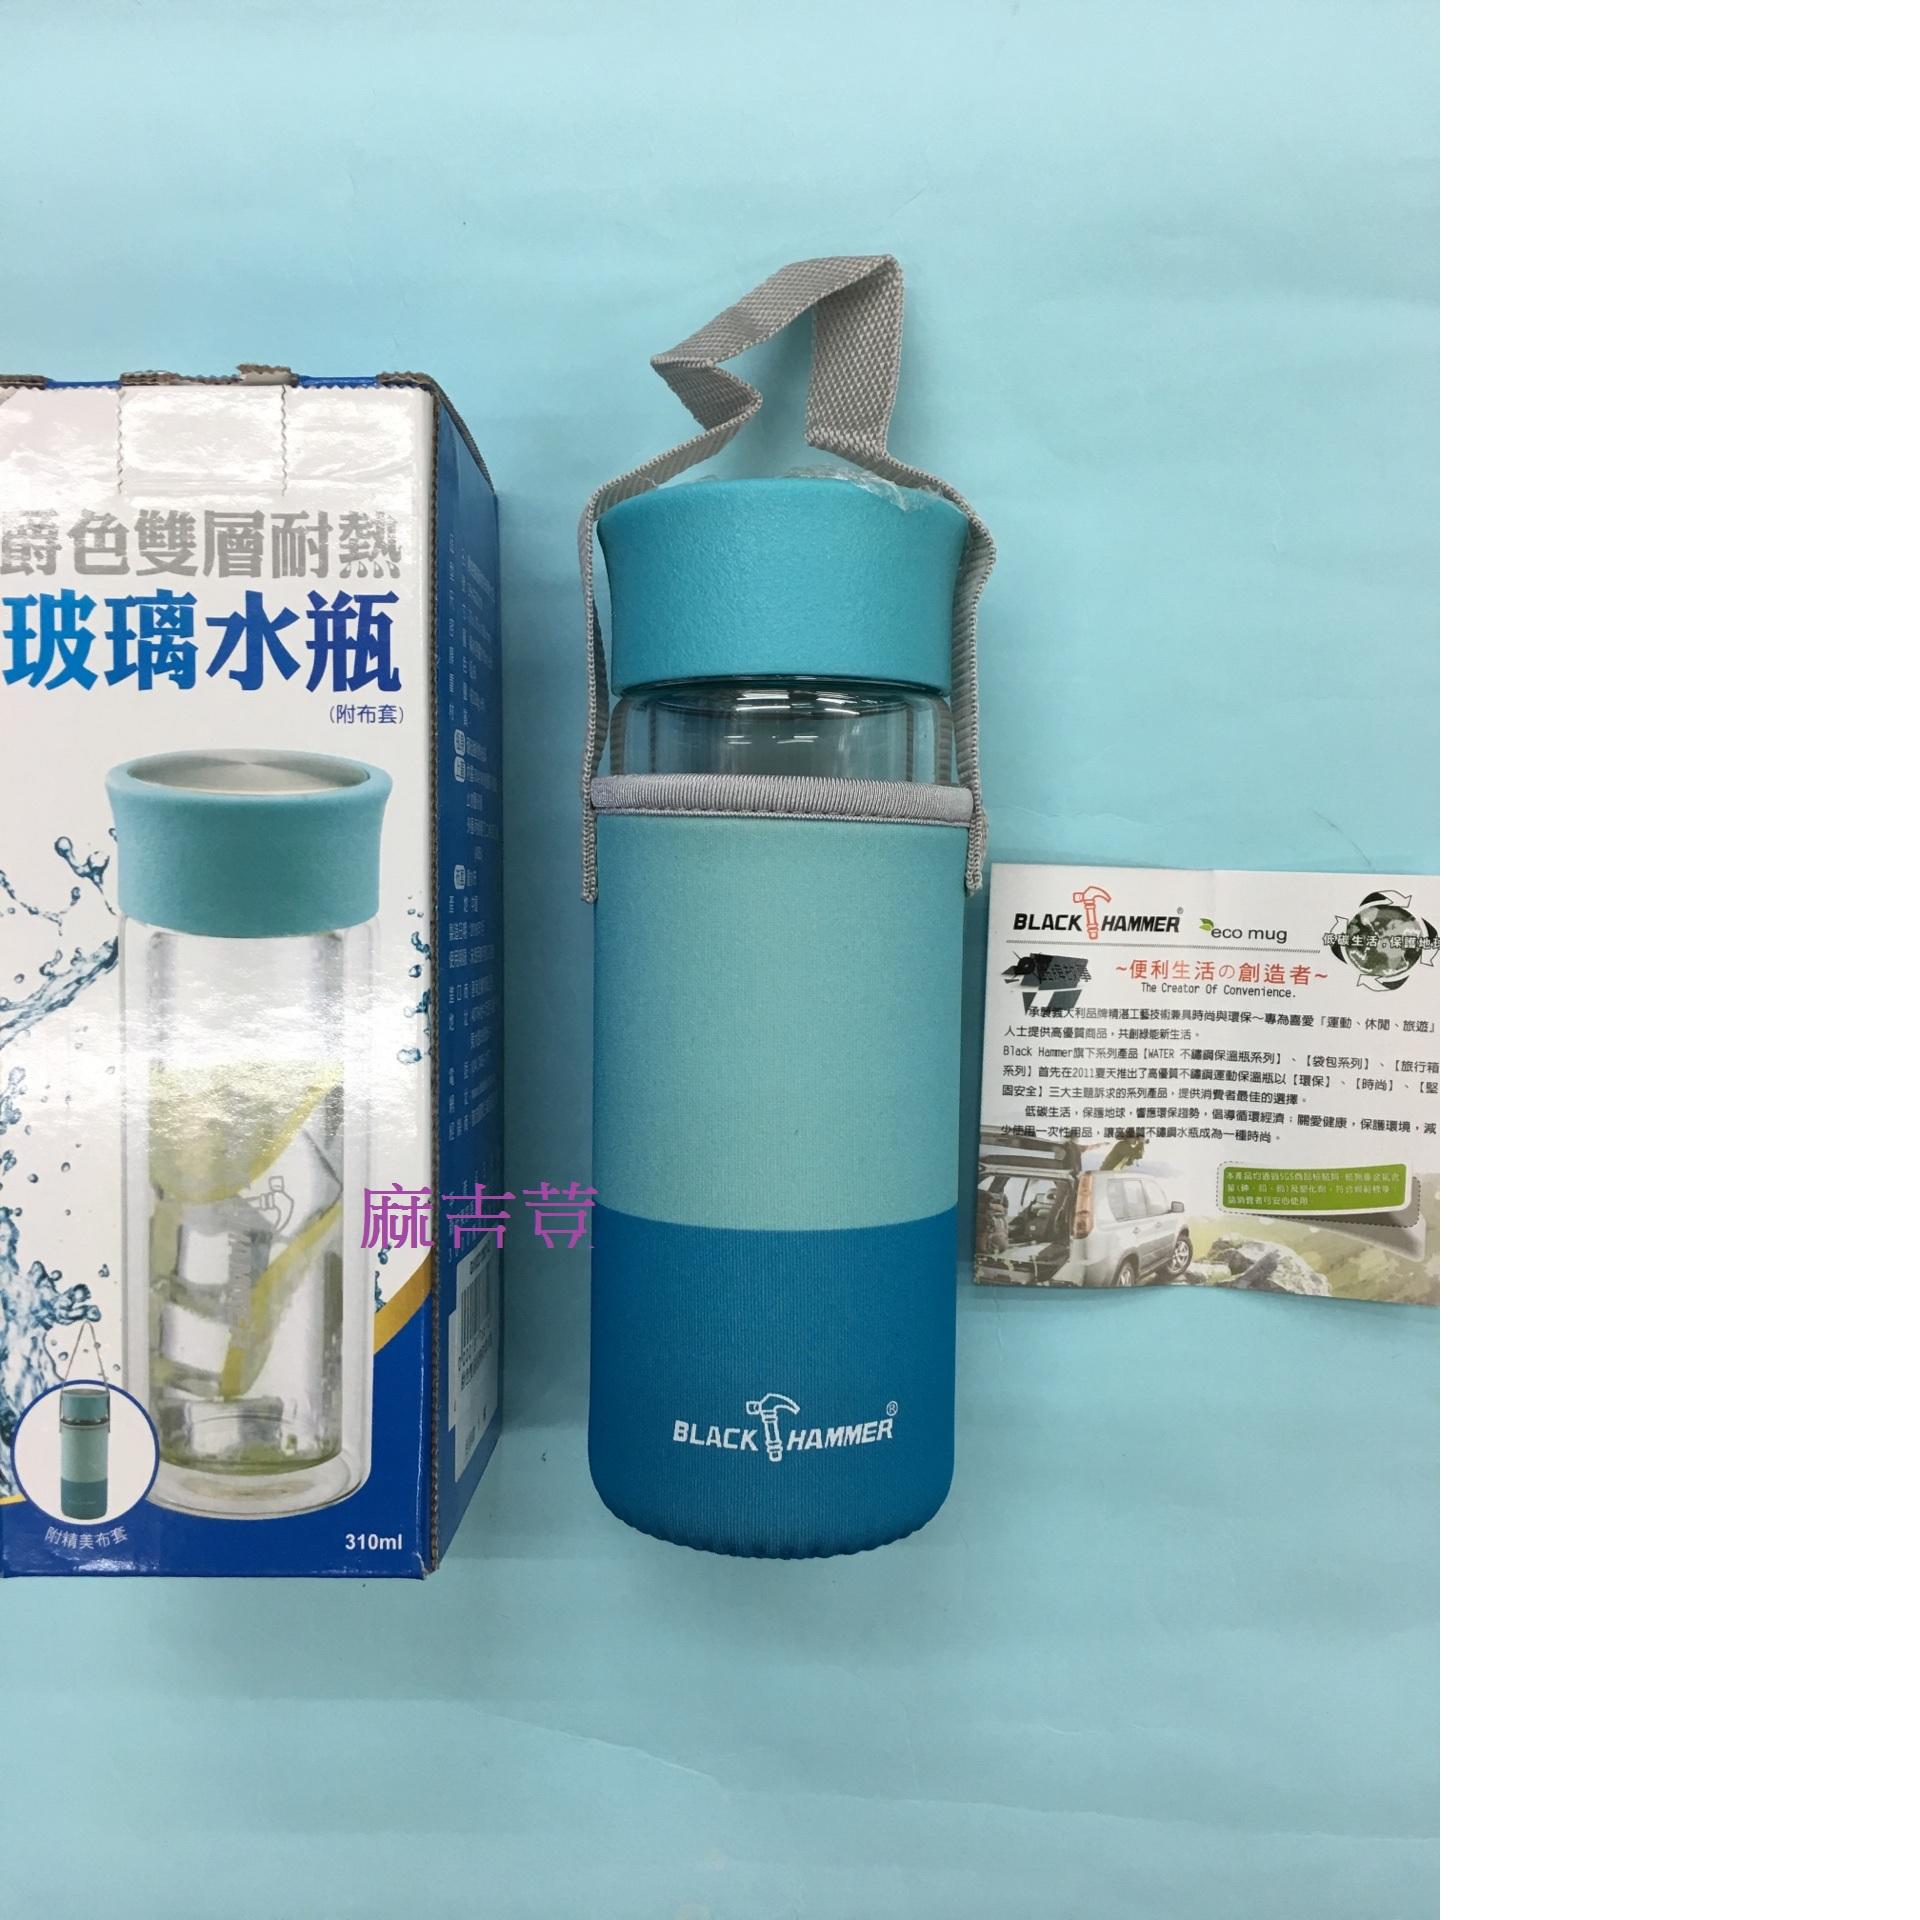 BLACK HAMMER輕量-爵色雙層耐熱玻璃水瓶 附精美布套 容量:約310ml水壺/保溫瓶 運動休閒旅遊環保最佳選擇